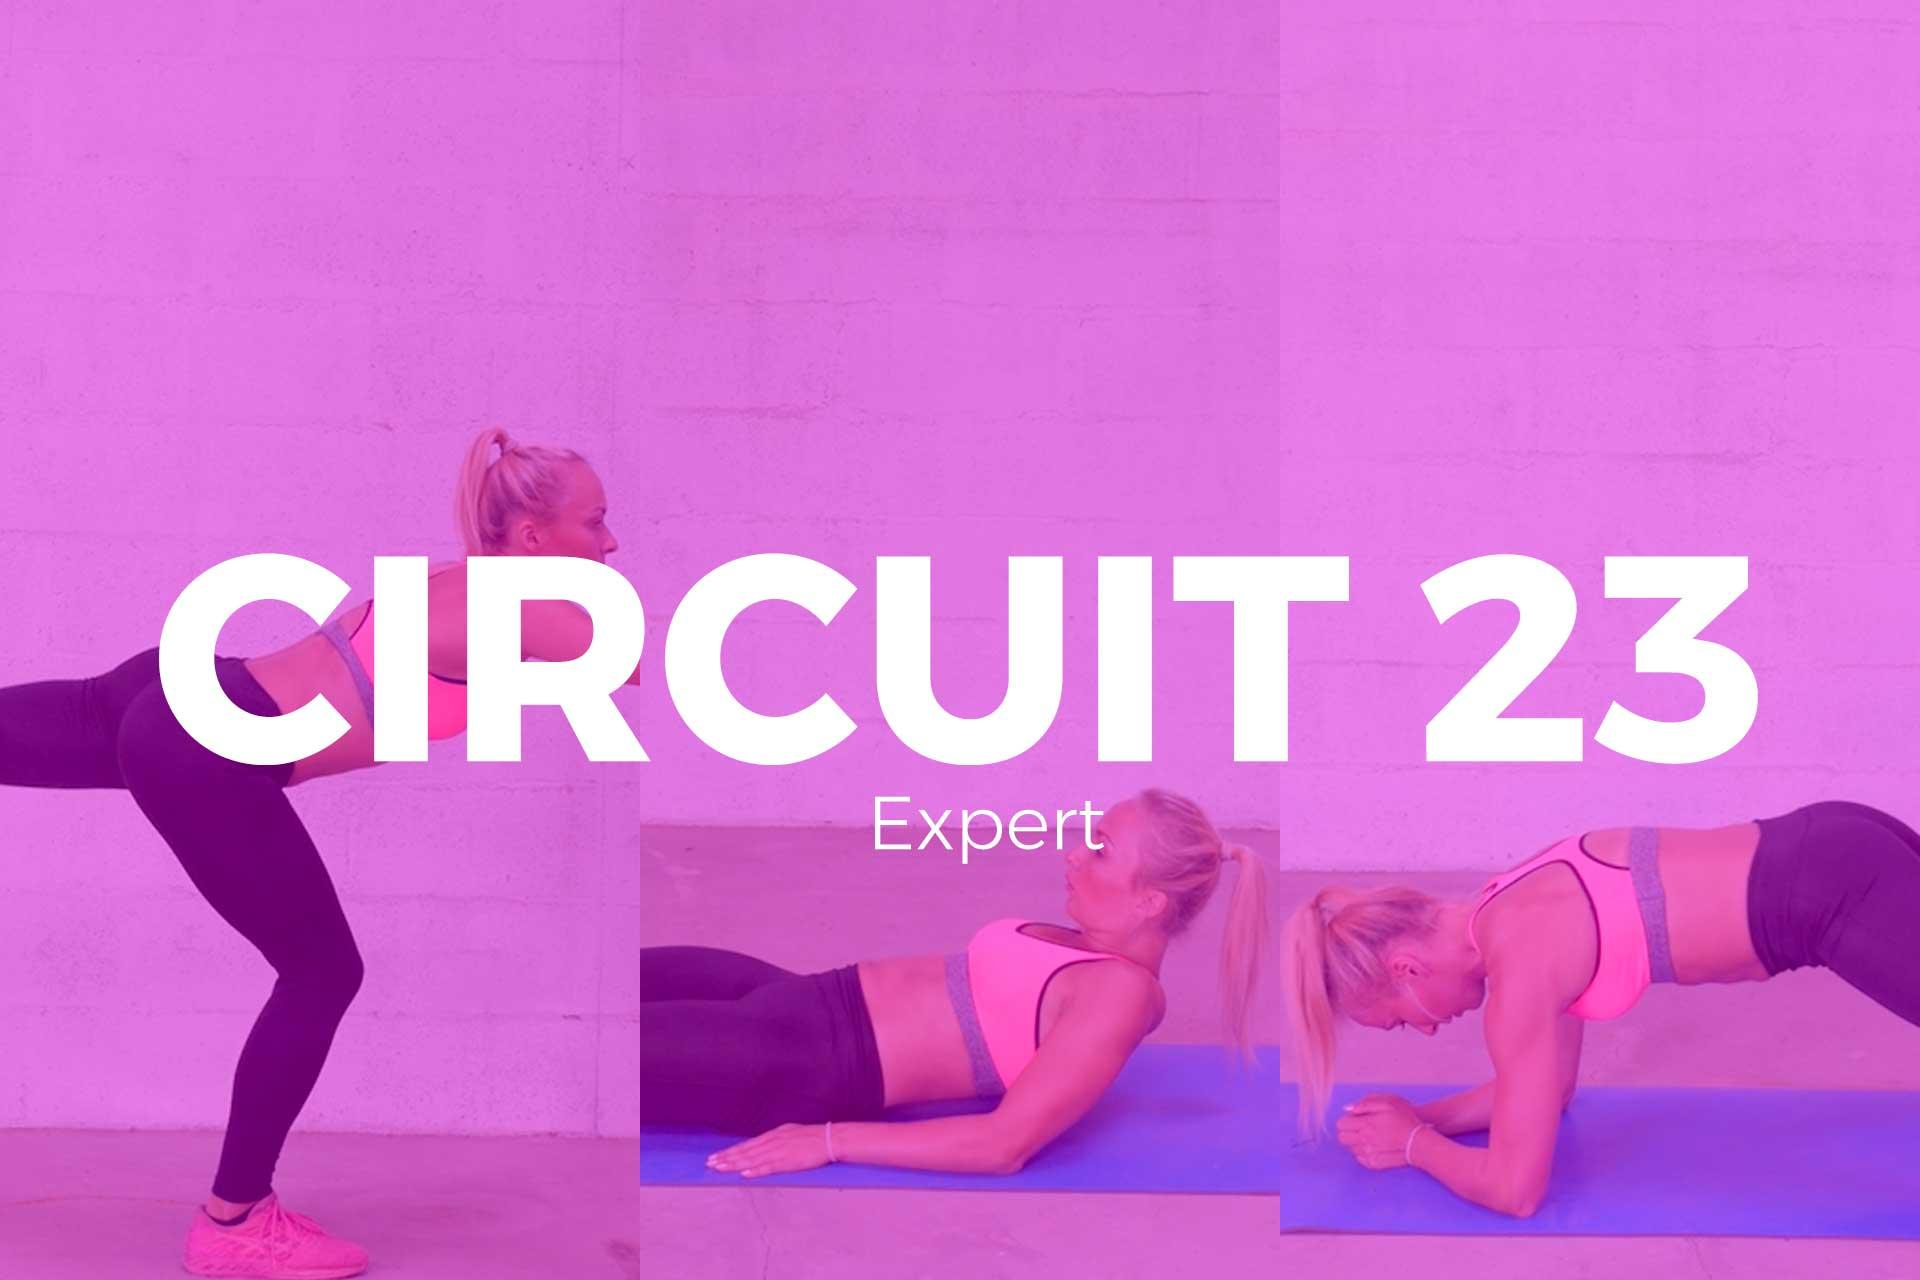 circuit-23